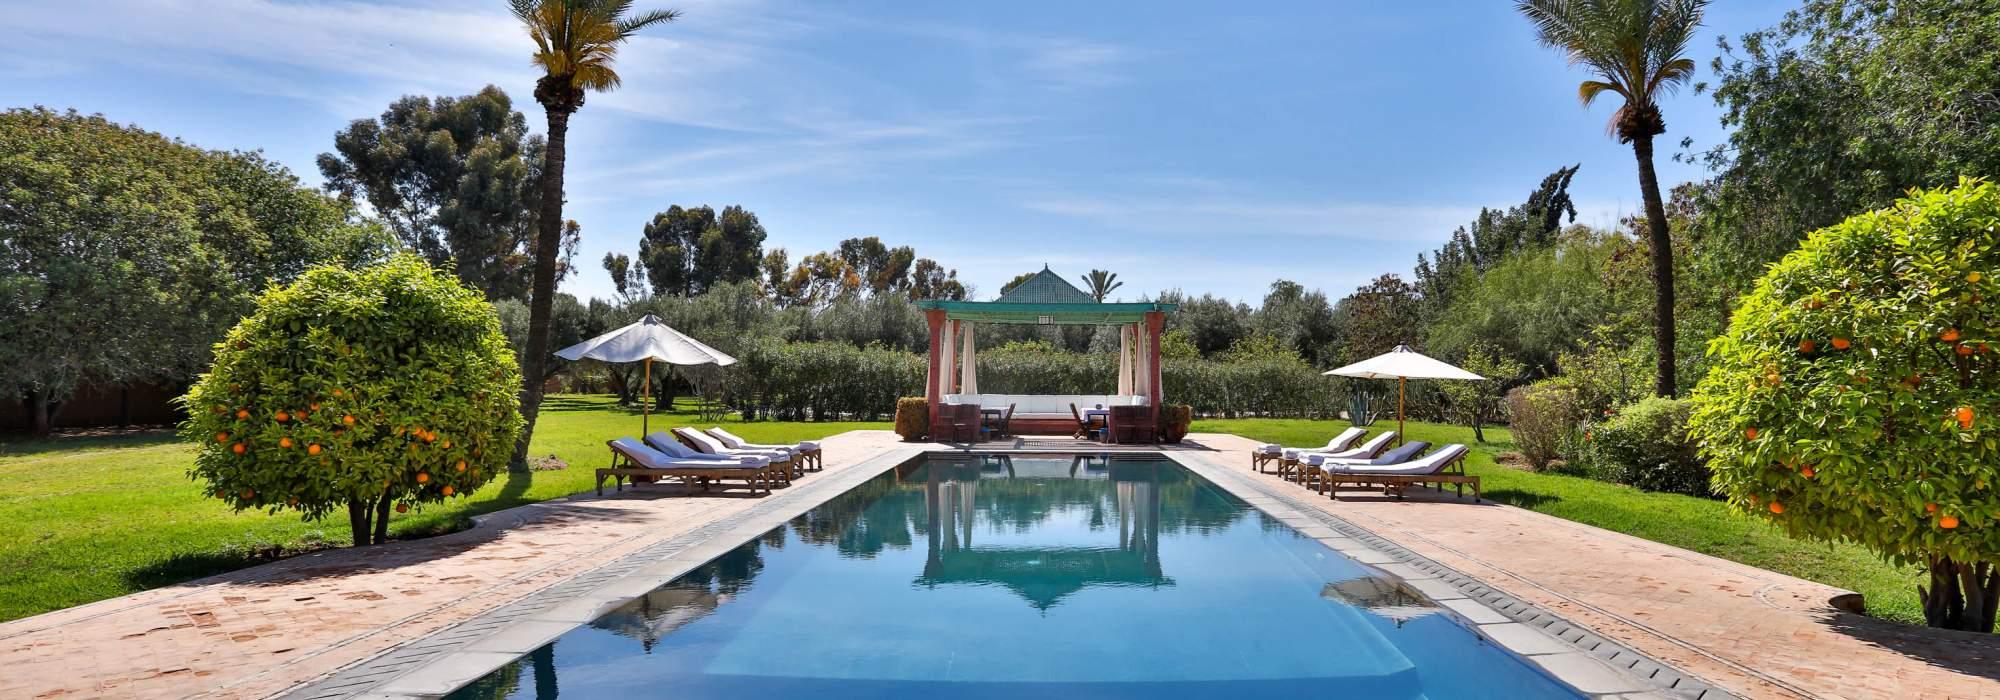 villa boccara a vendre palmeraie marrakech